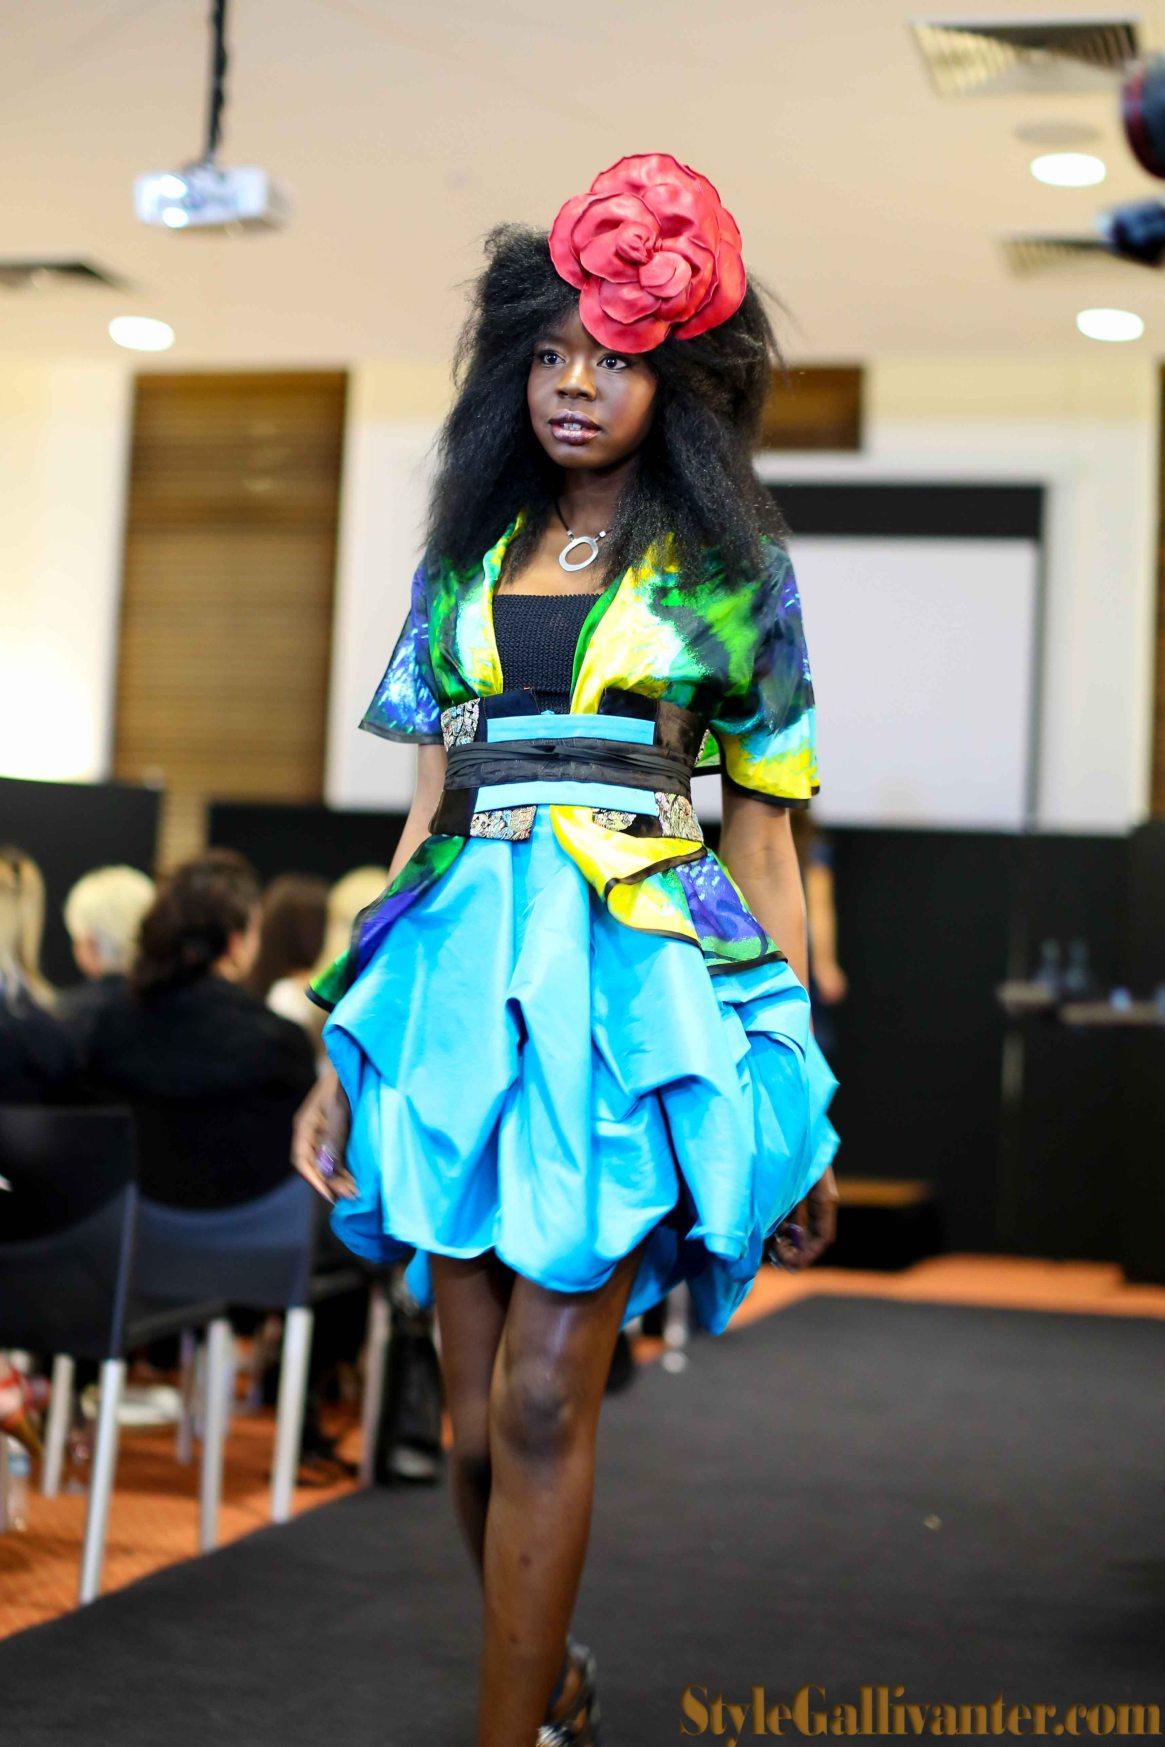 polka-dot-editorials_ a-line-dress-editorials_vogue-editorials-polka-dots_best-personal-style-bloggers-africa_best-personal-style-bloggers-australia_africas-best-fashion-blog-45